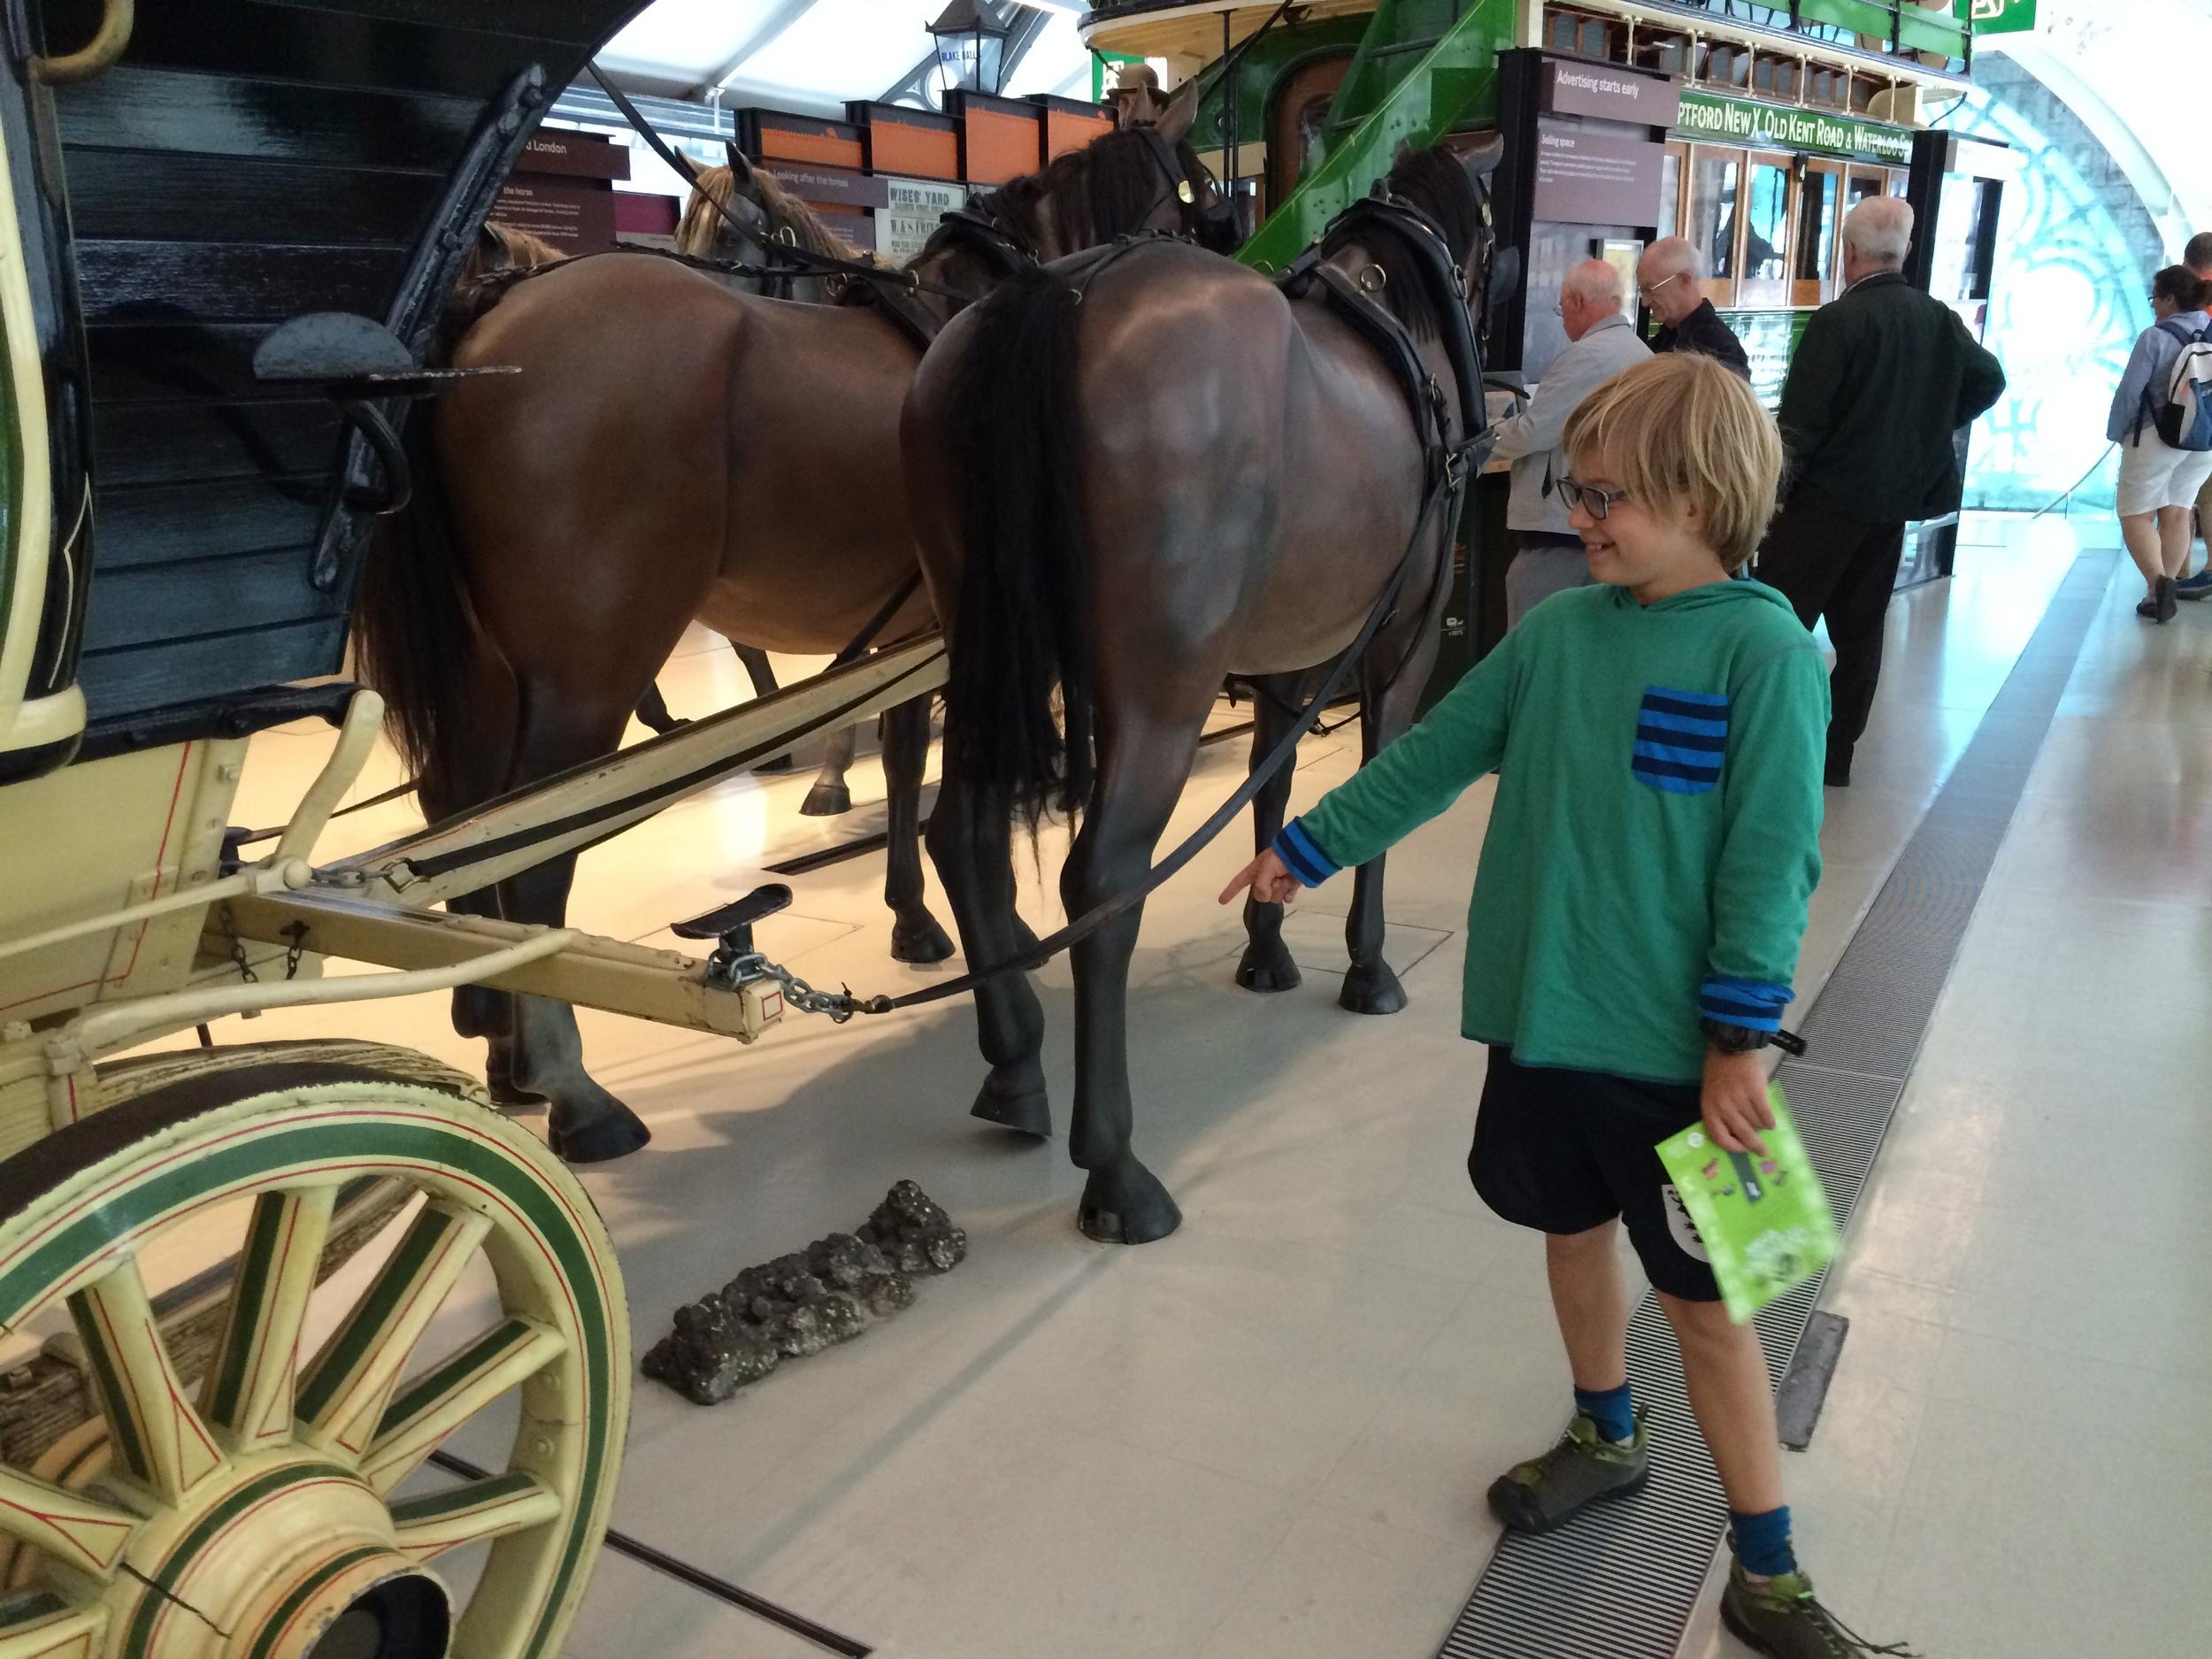 The original omnibus - complete with horse poop!